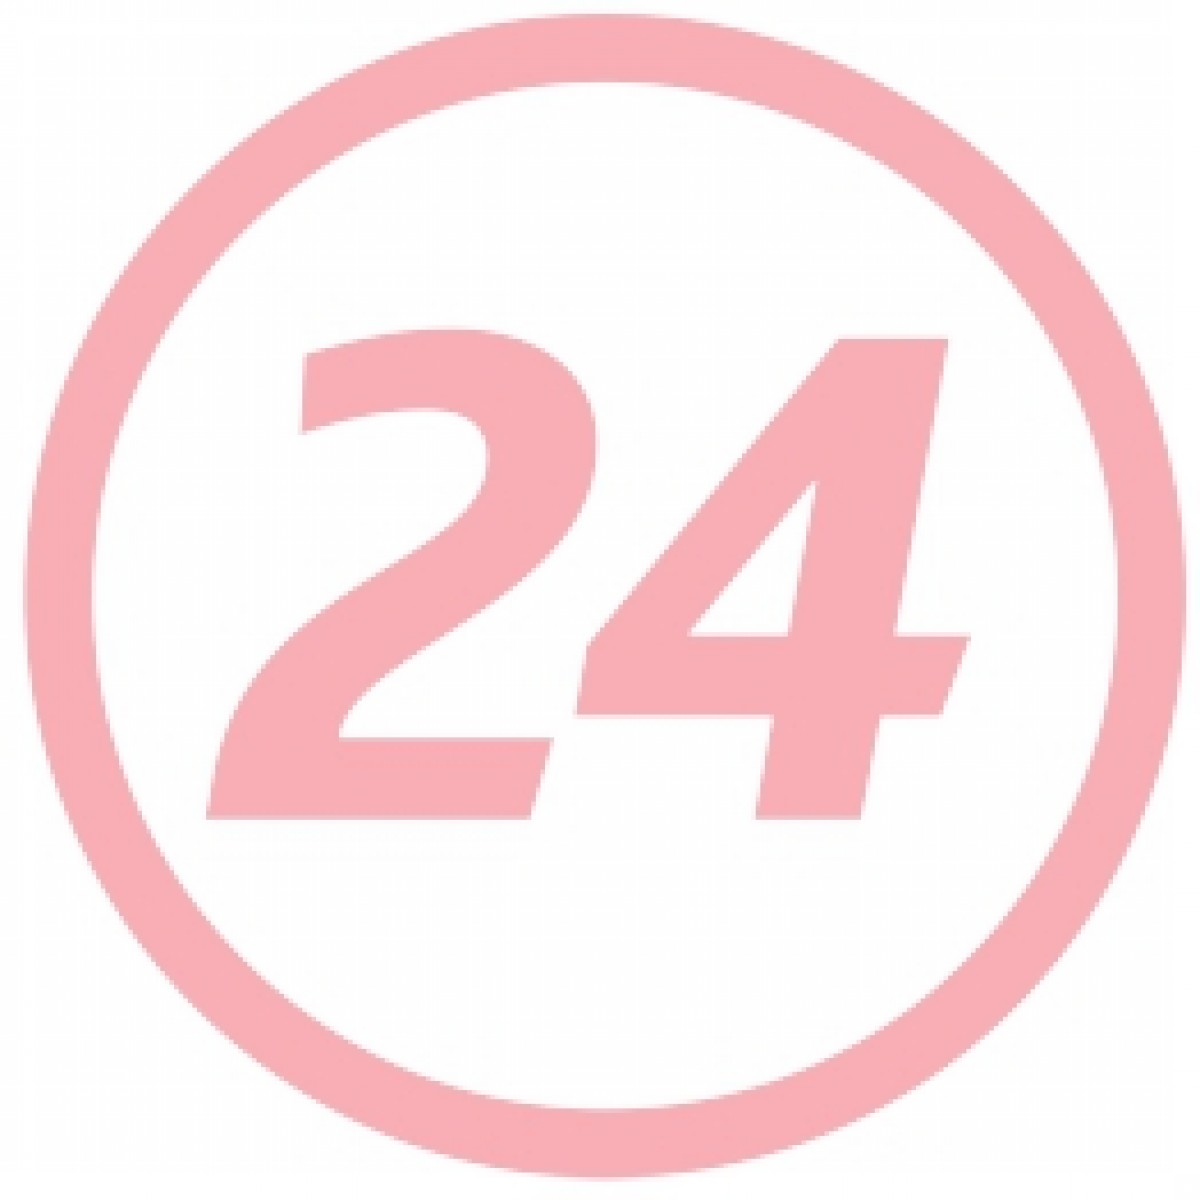 Vichy Dercos Neogenic Unisex Tratament Pentru Crestere Capilara, Tratament, 28 Fiole